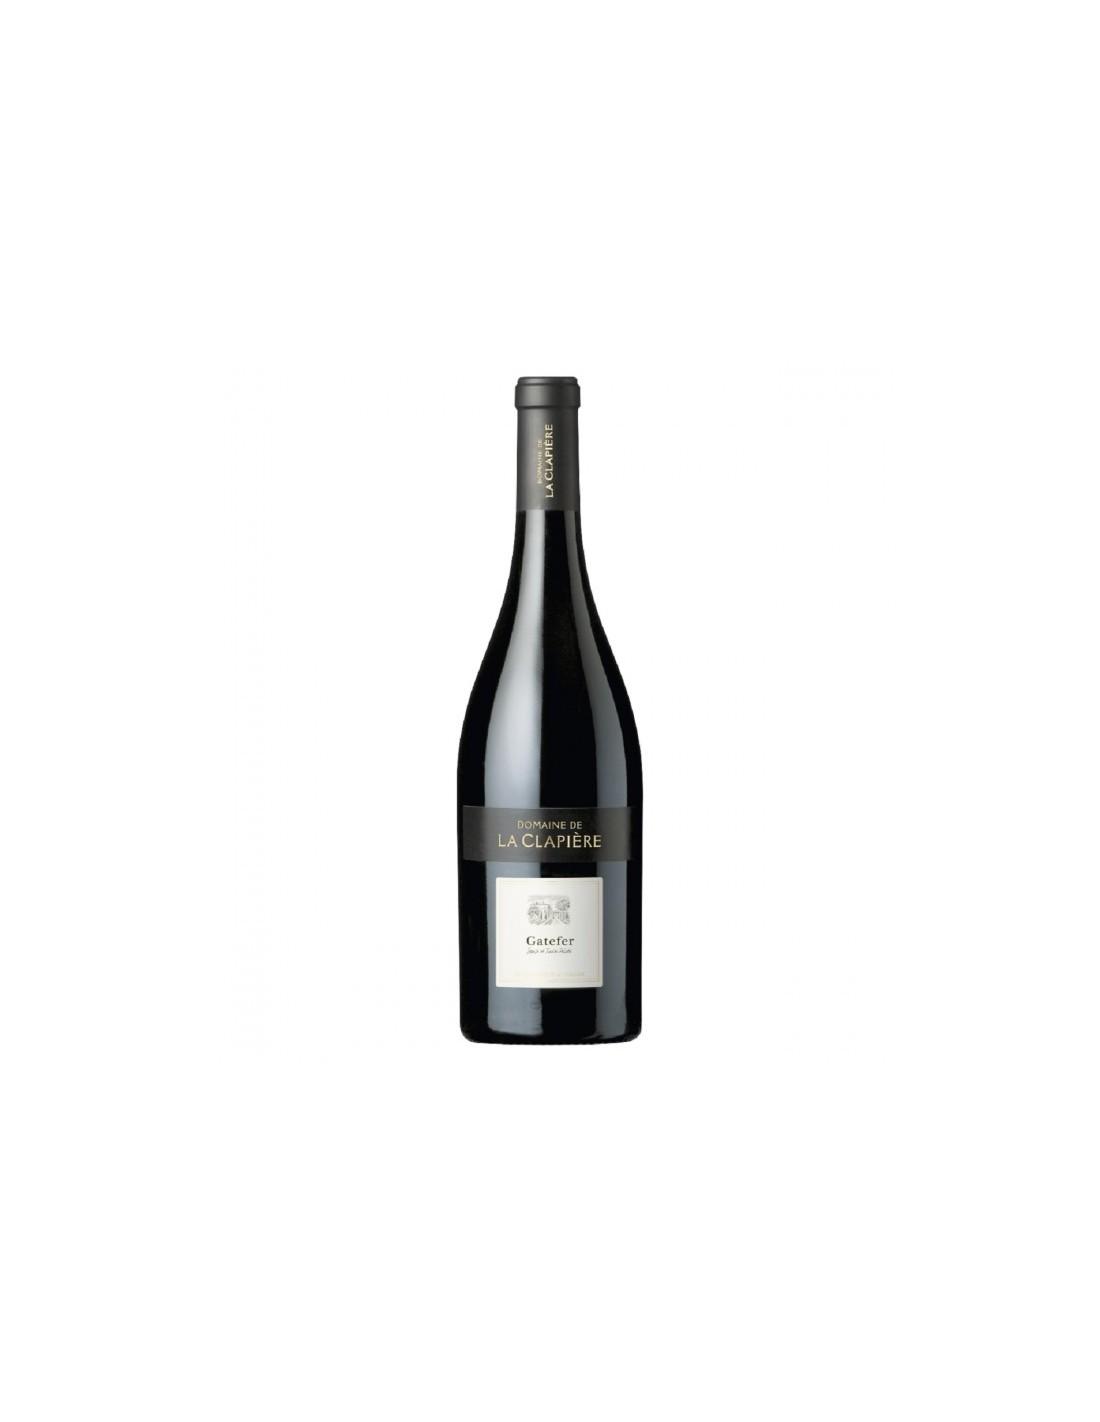 Vin rosu, Cupaj, Gatefer Pays d'Oc, 0.75L, 14% alc., Franta